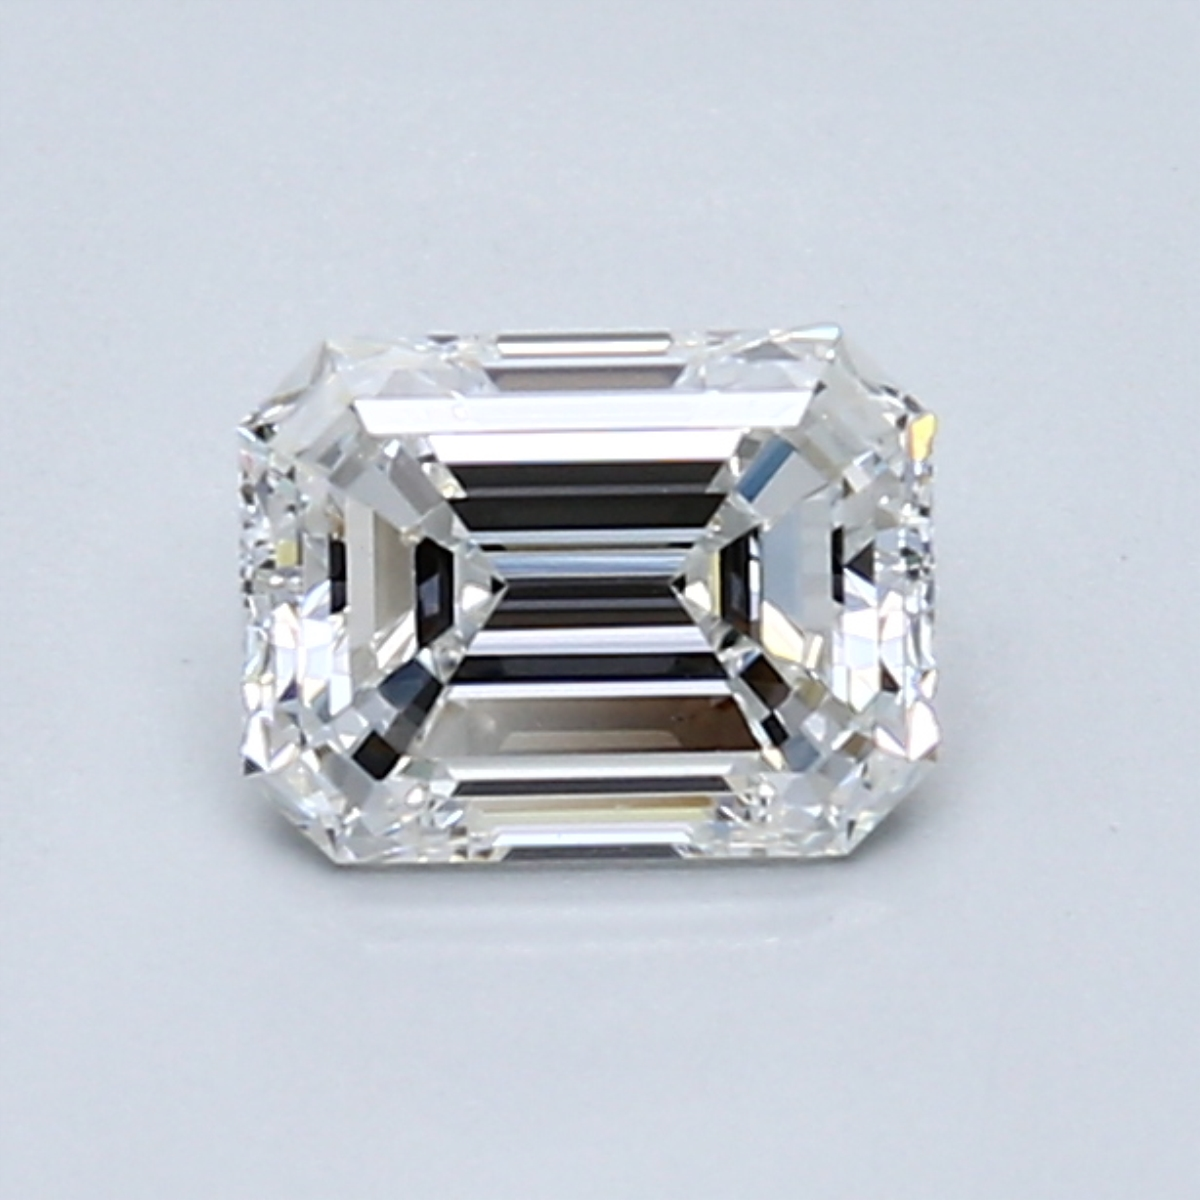 .80 carat Emerald Diamond, Very Good cut, graded by the GIA laboratories.